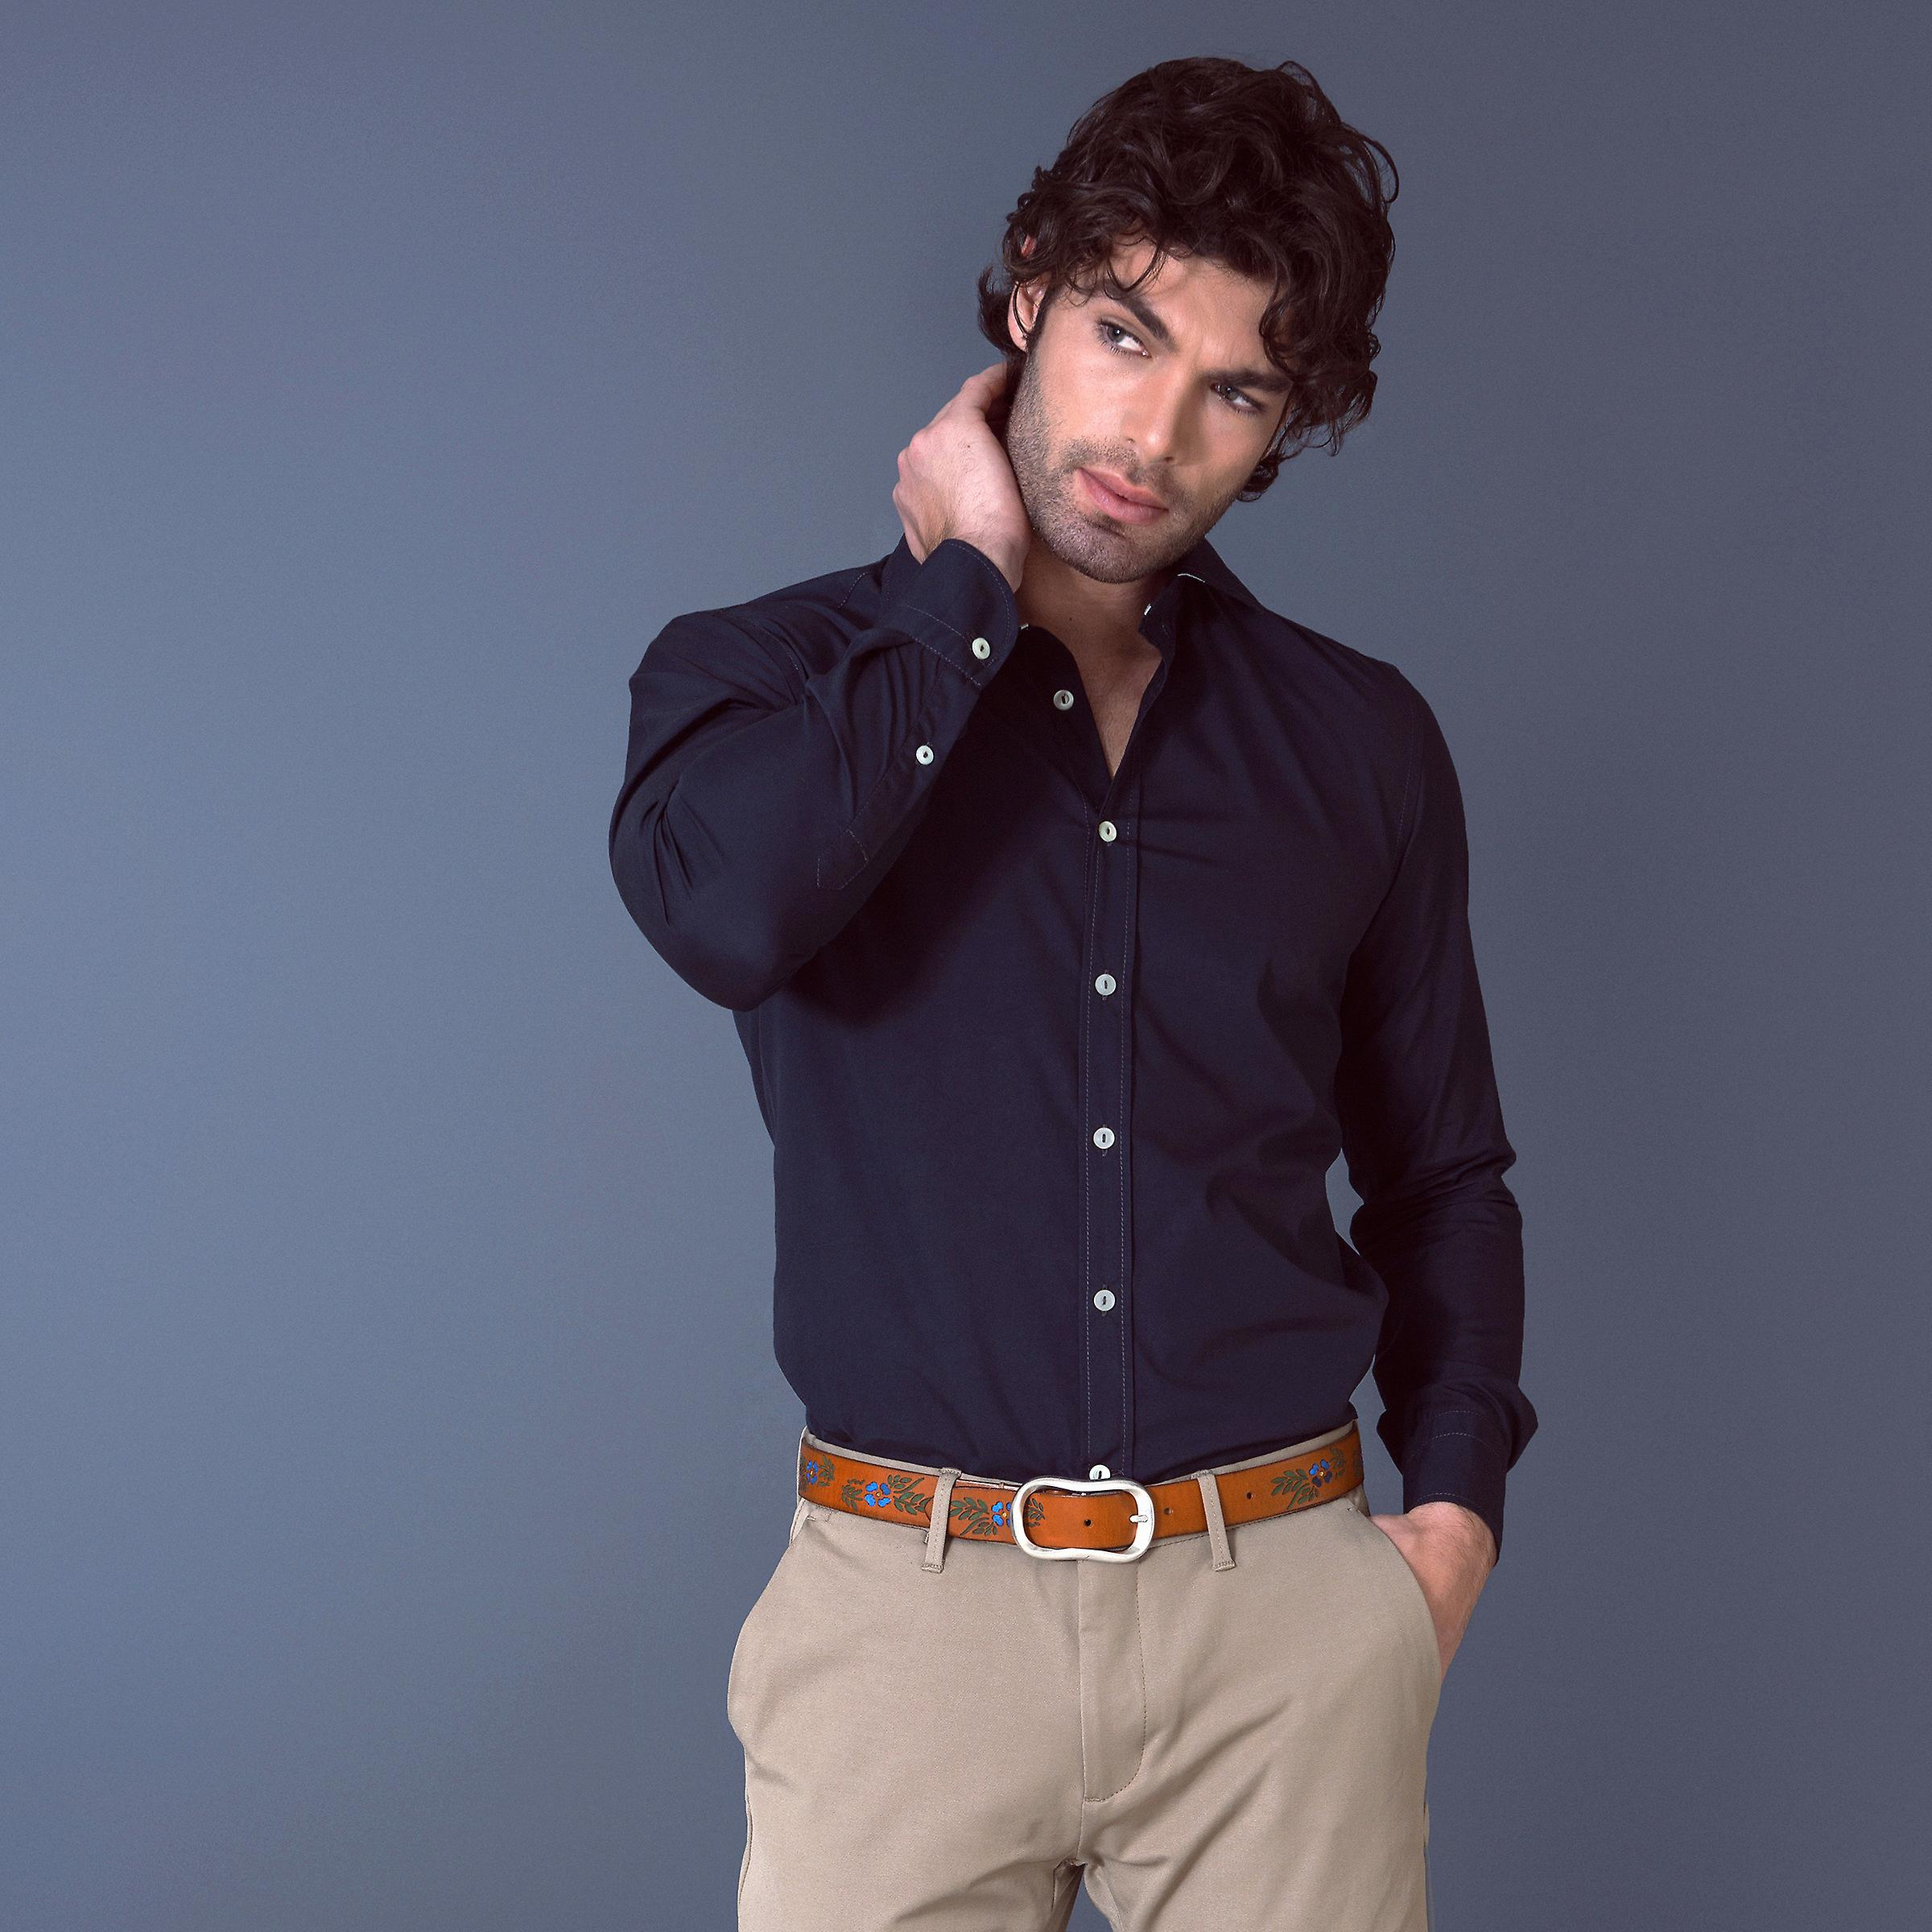 Fabio Giovanni Trapani Shirt - Mens High Quality Silky Black Cotton Poplin Shirt